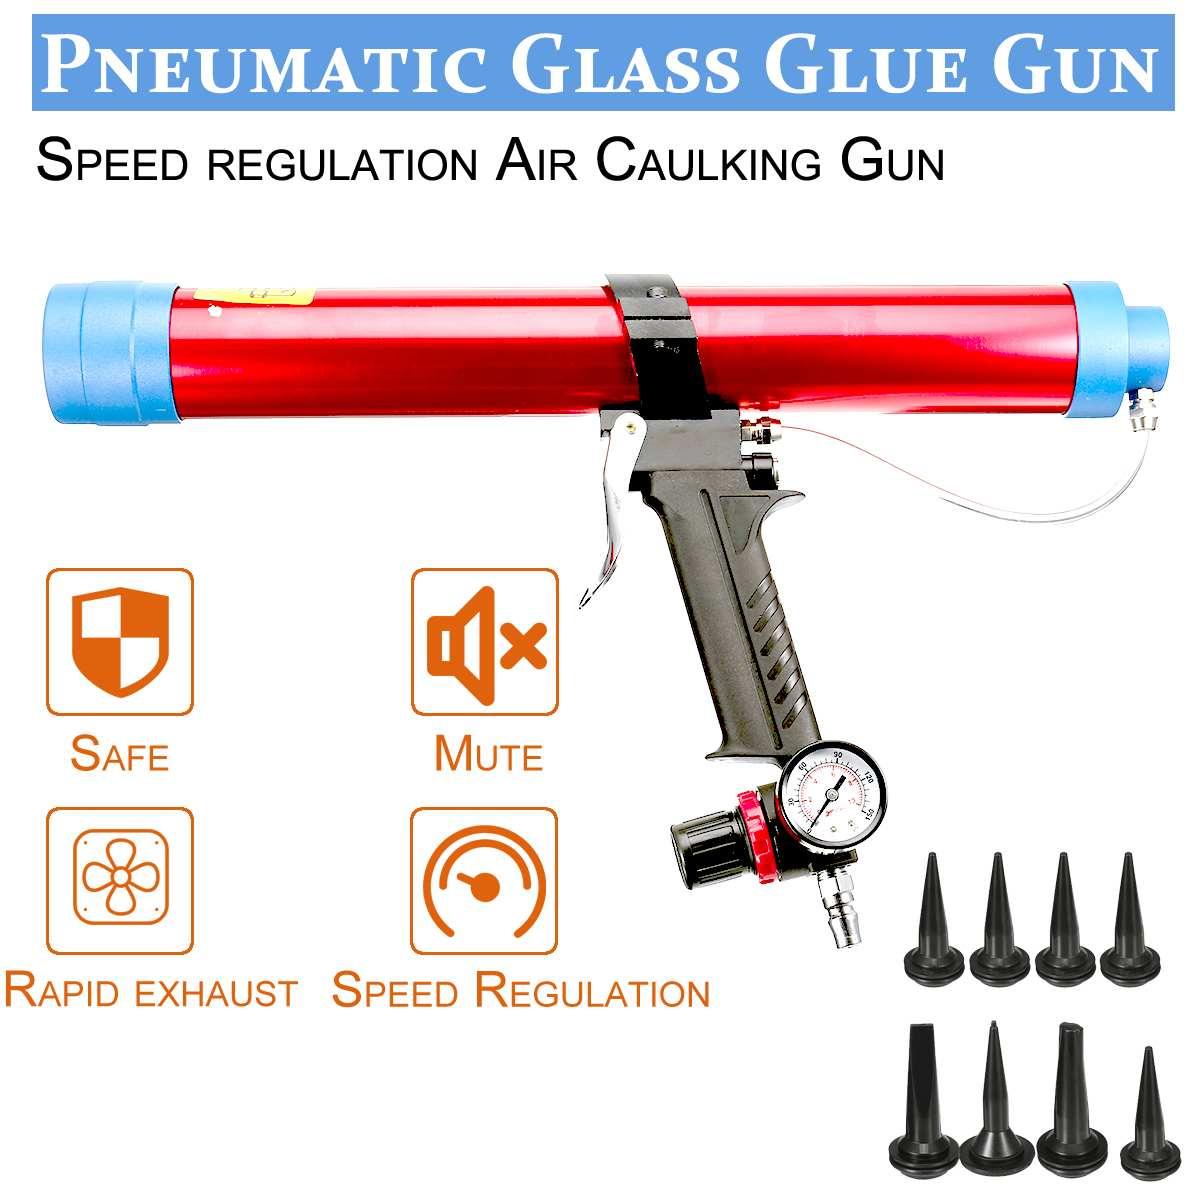 600ml Glass Glue Caulk Guns Air Rubber Pneumatic Caulking Gun Pistol With Pistons Tool Caulking Glass Silicone Tools